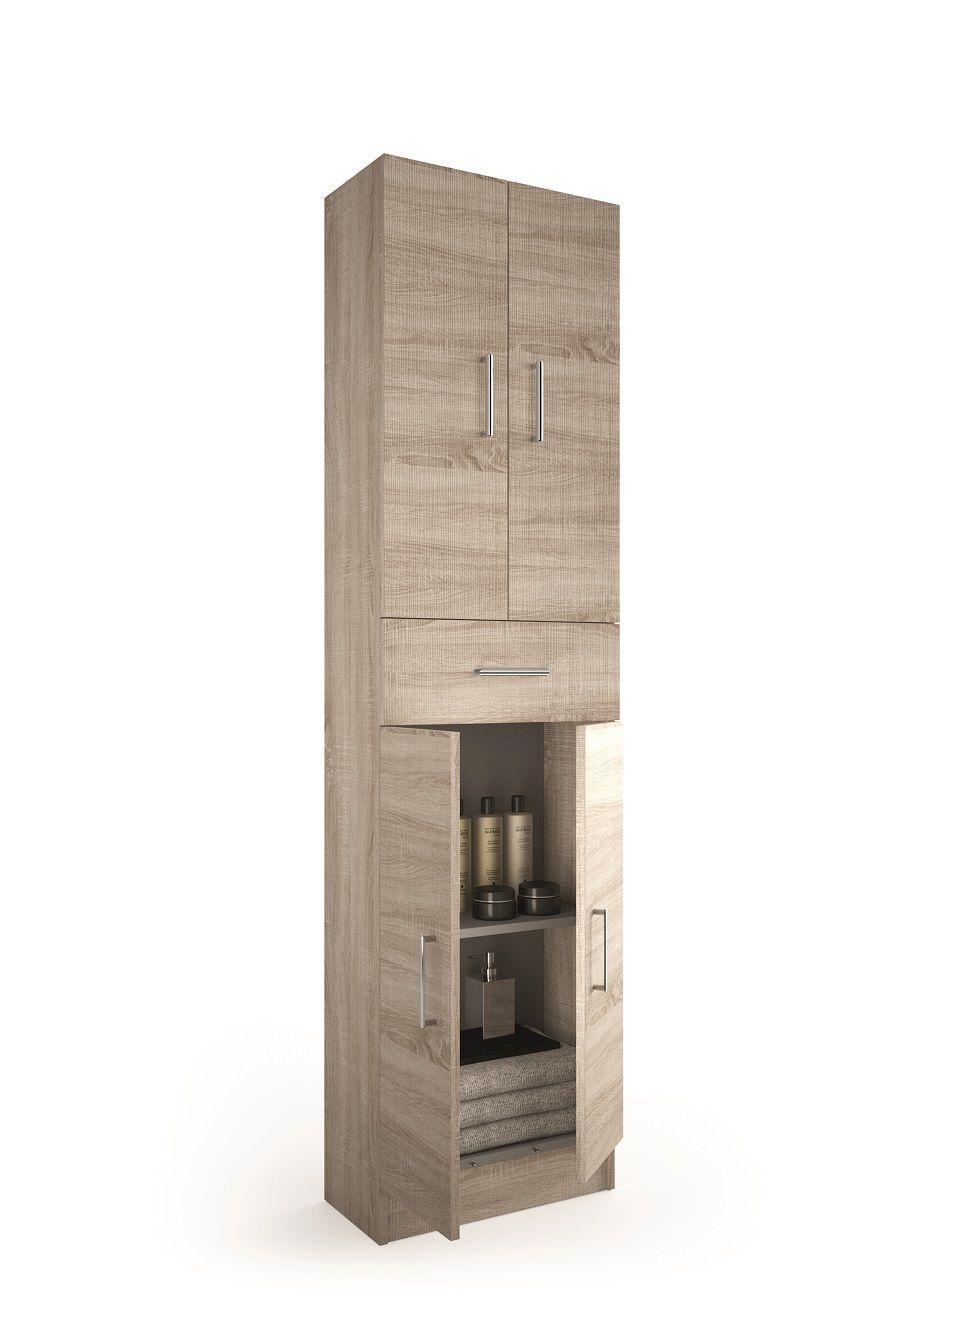 Muebles Auxi hoge opbergkast caledonia 180x48x24cm 4 deuren 1 lade